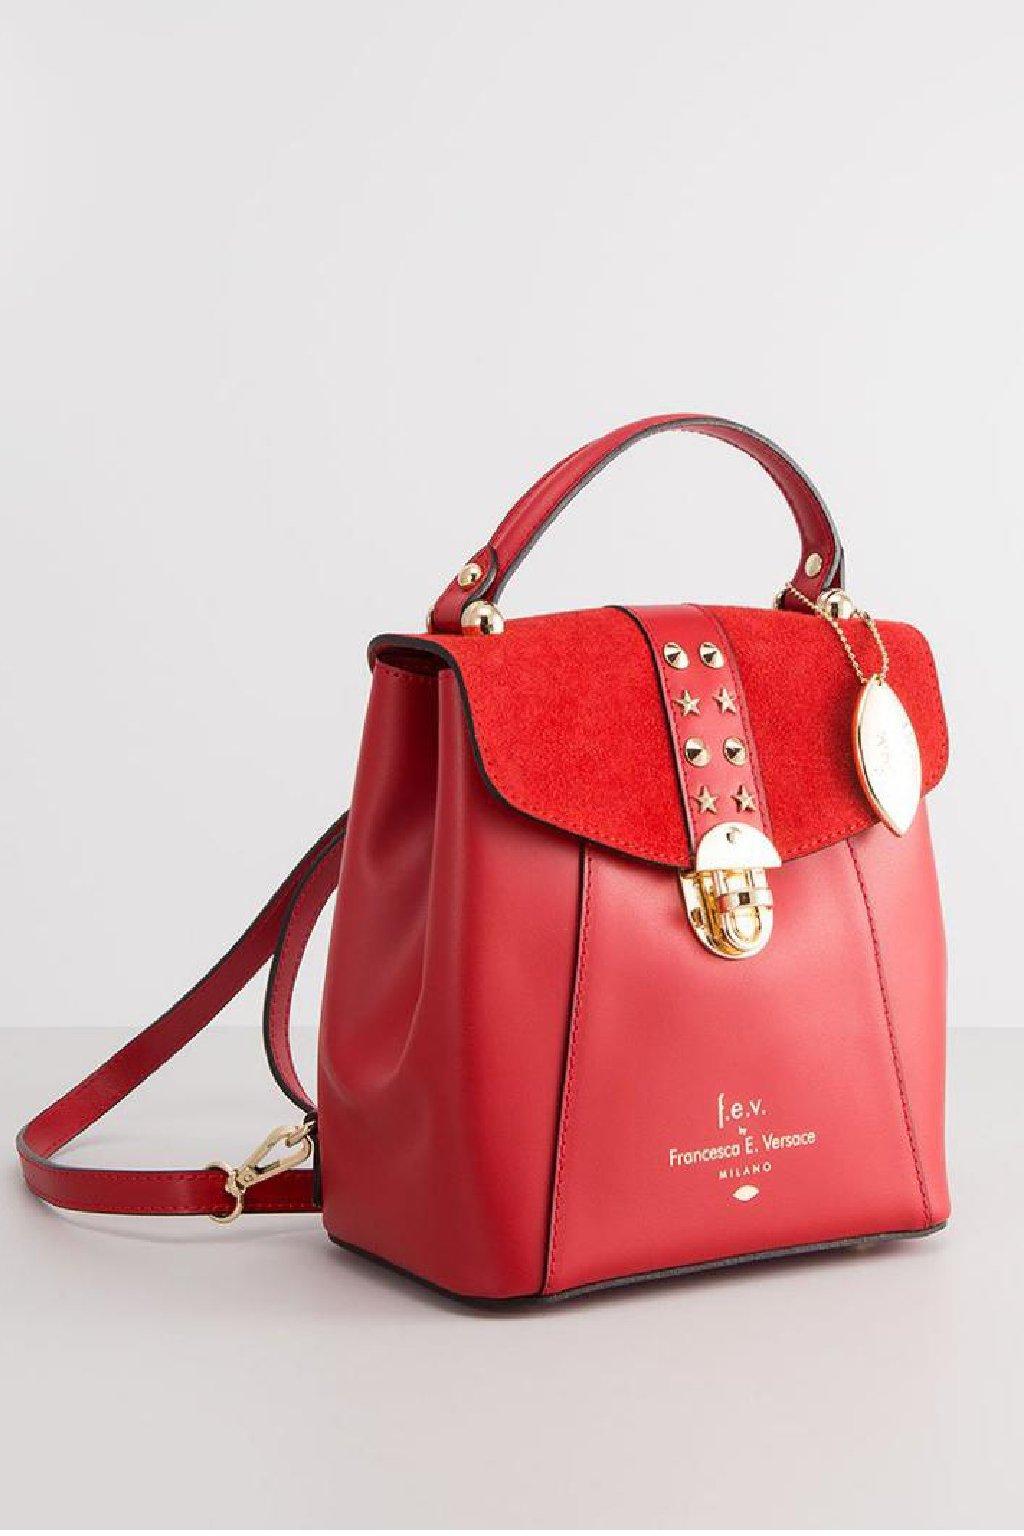 Luxusni damsky batuzek Versace cervena barva (4)